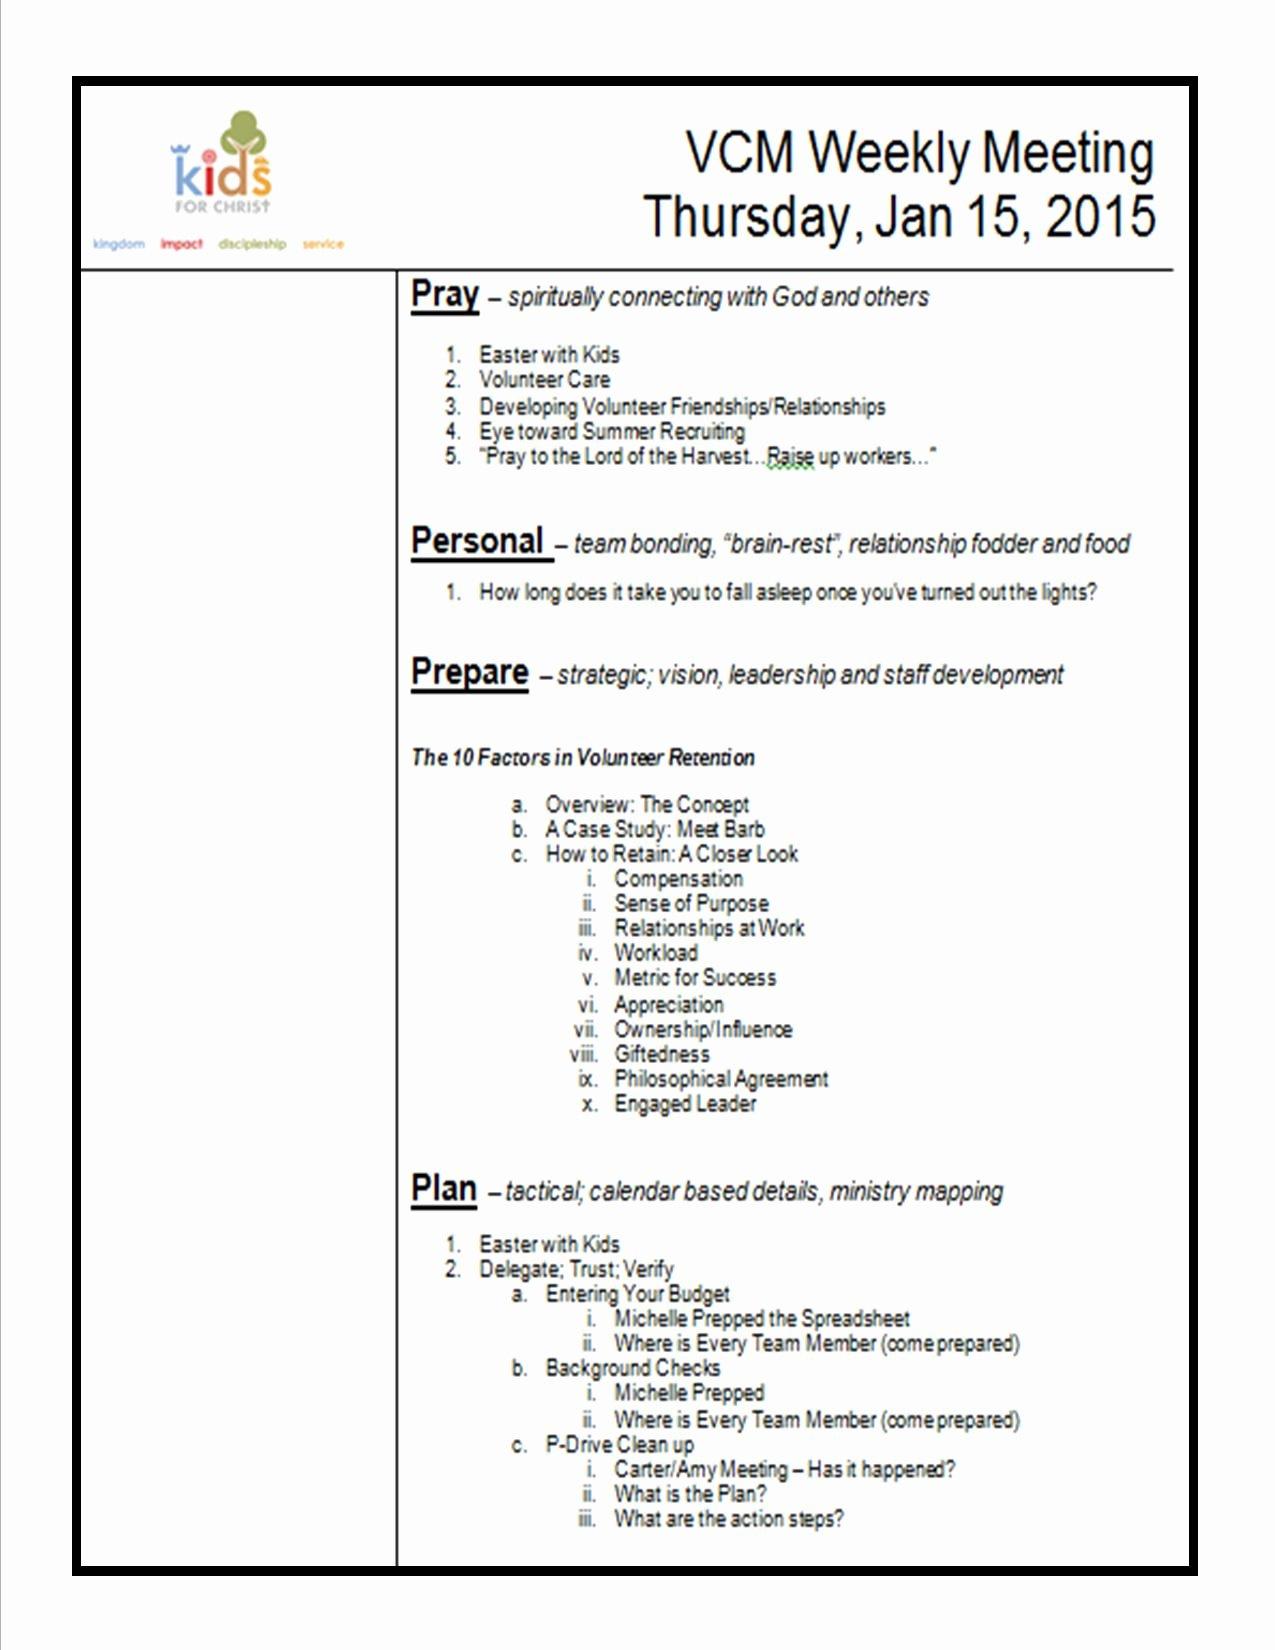 Meeting Minutes Agenda Template Fresh How to Create A Meeting Agenda Kidminscience